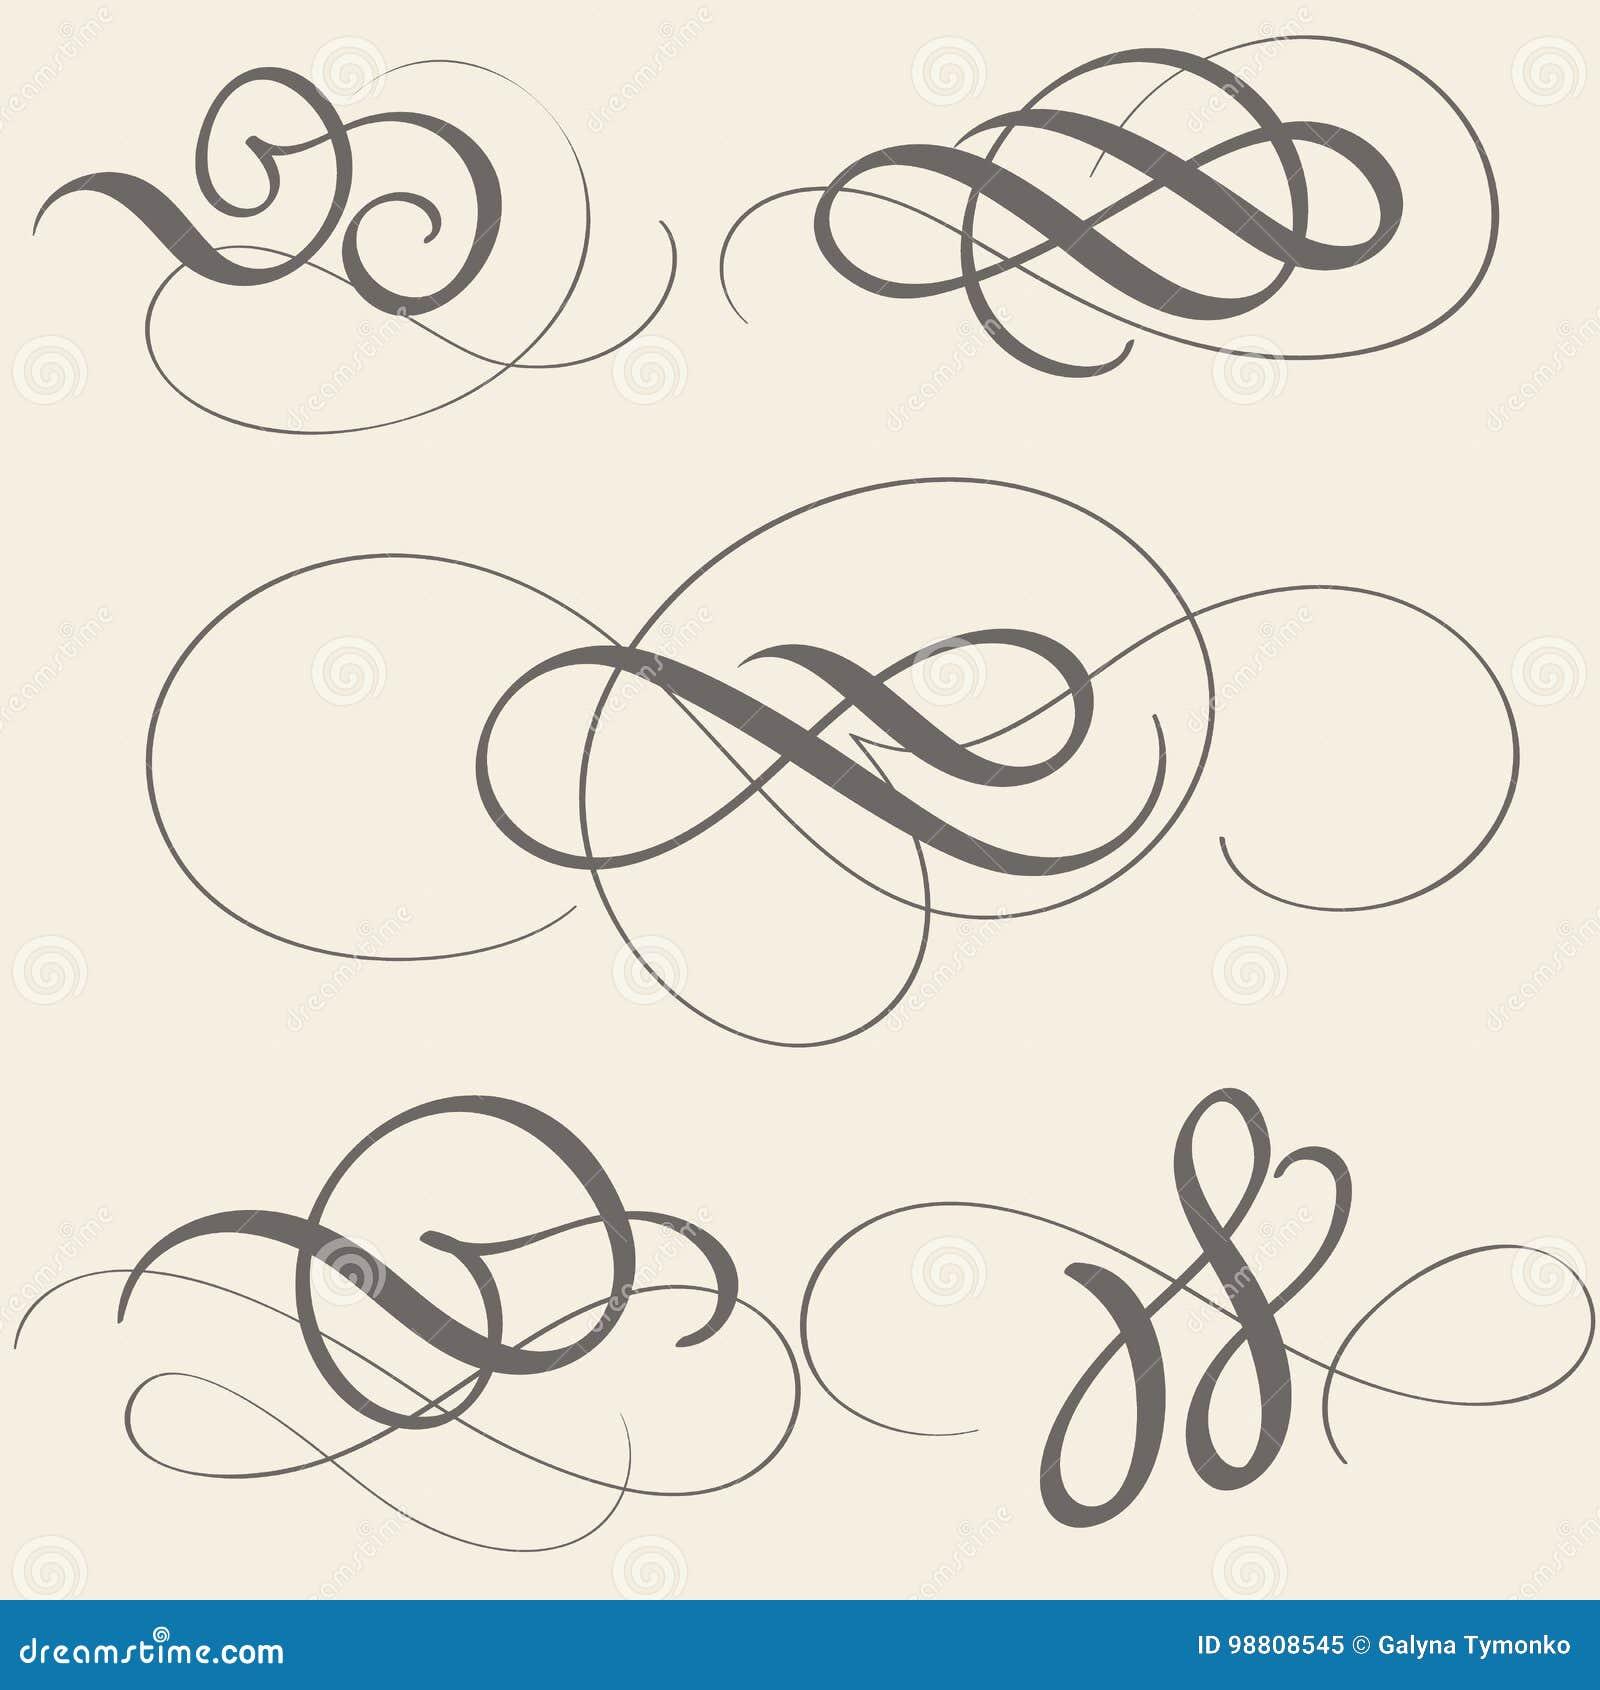 Set of calligraphy flourish art with vintage decorative whorls for design on beige background. Vector illustration EPS10